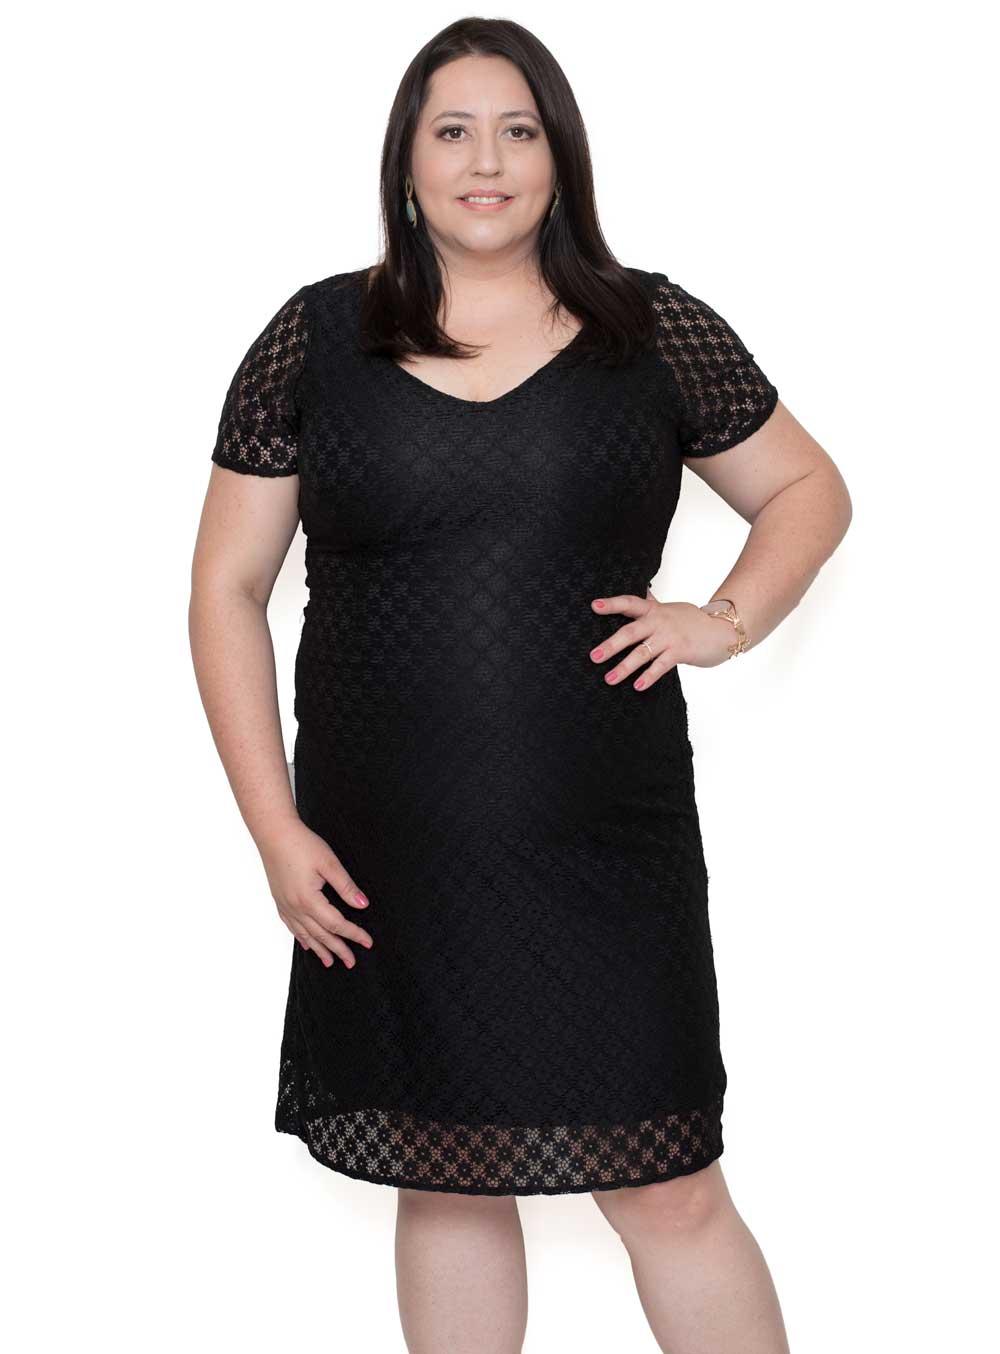 cad29b1f0 FOTOS. Vestido Festa Renda Plus Size Preto - Moda Plus Size Feminina -  UNIVERSO PLUS ...